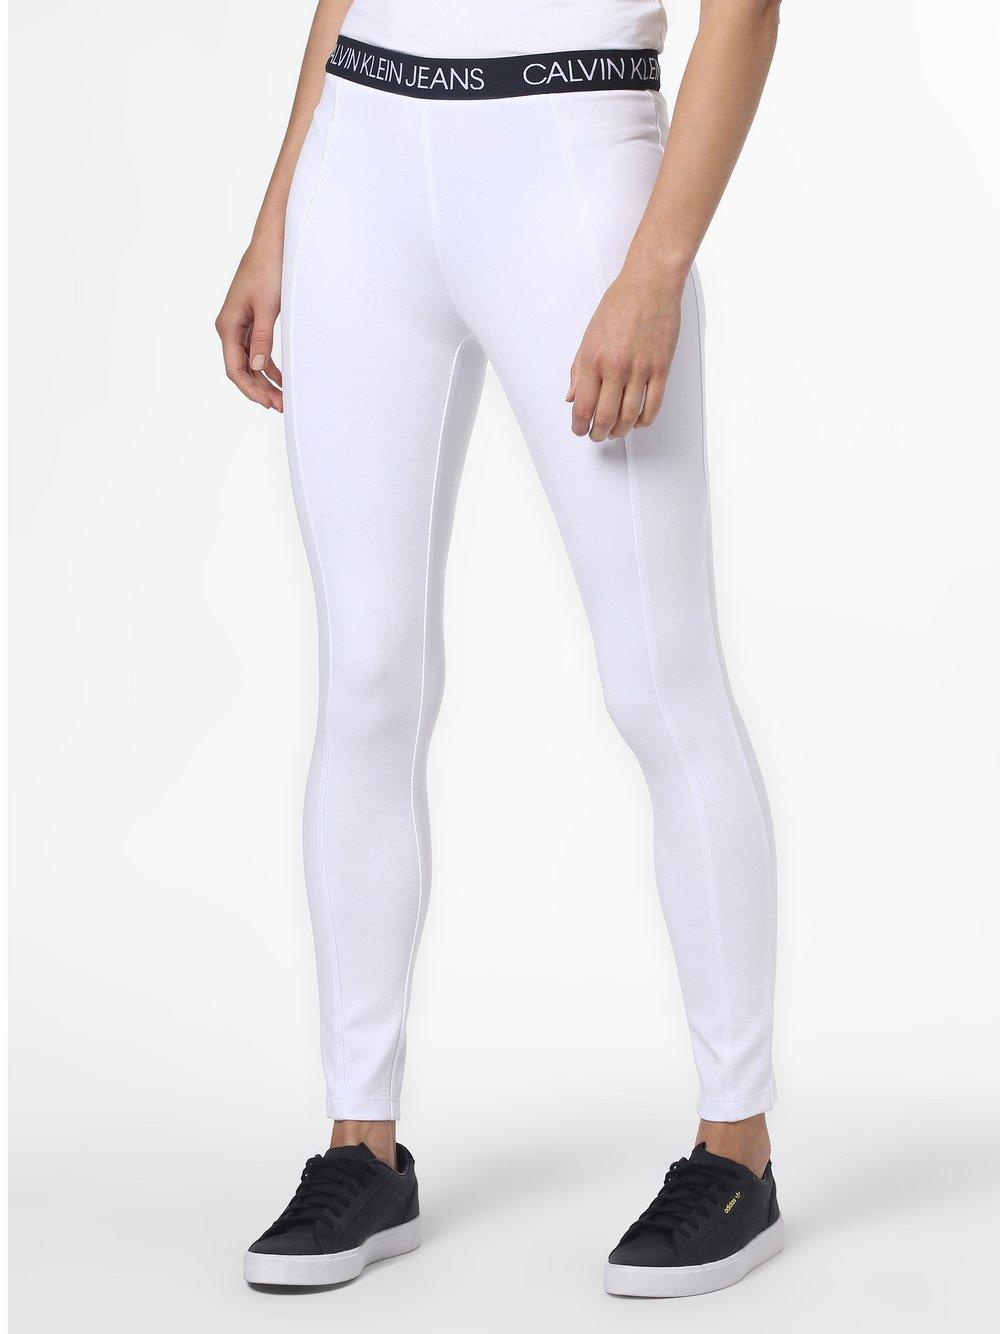 Calvin Klein Jeans - Legginsy damskie, biały